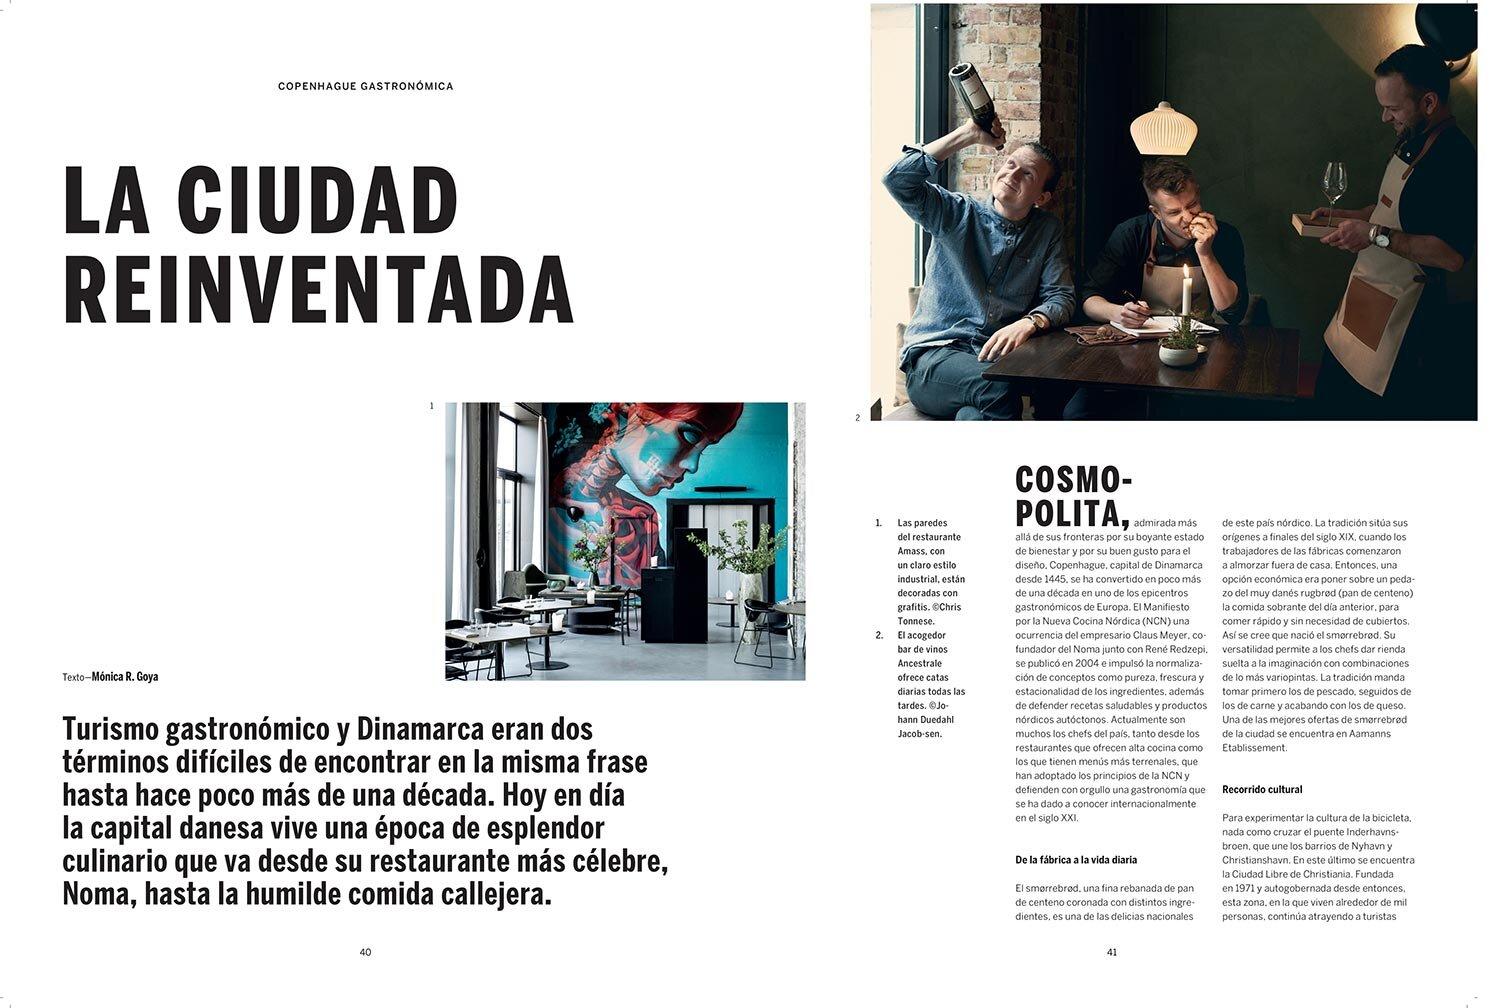 Copenhagen-food-Gourmets-magazine-MonicaRGoya-1.jpg